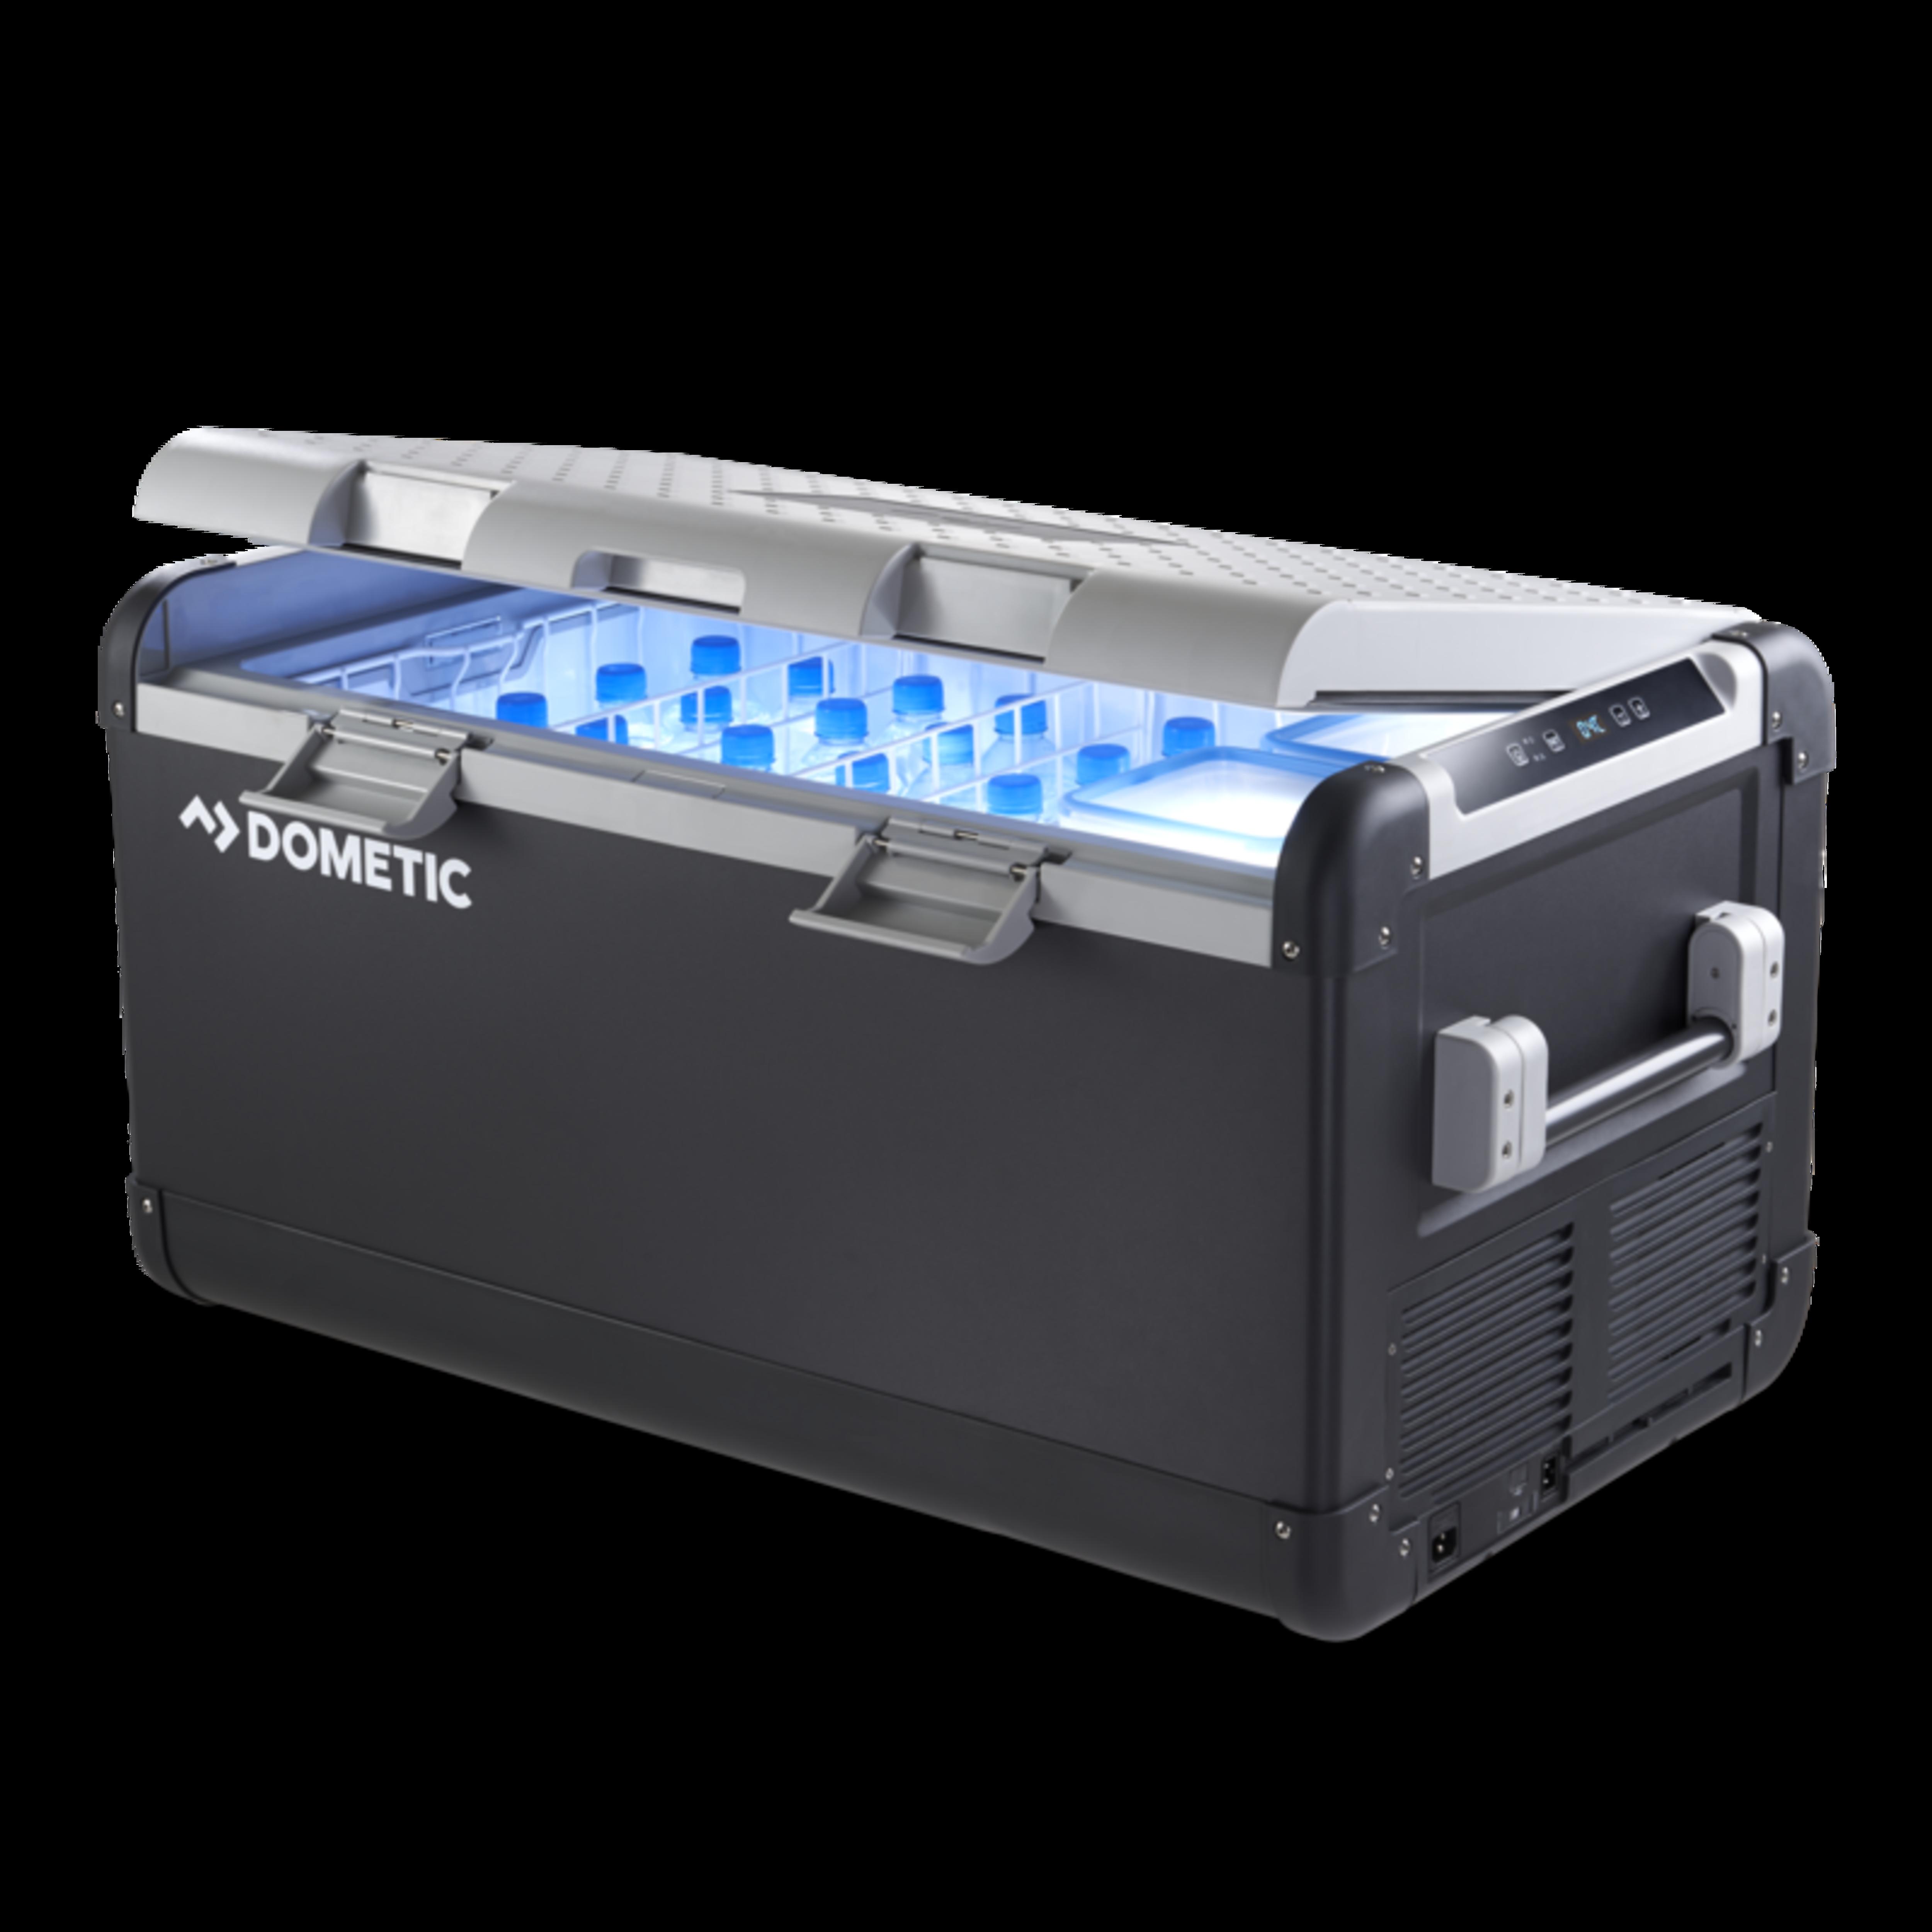 Dometic CoolFreeze CFX 100 Professional